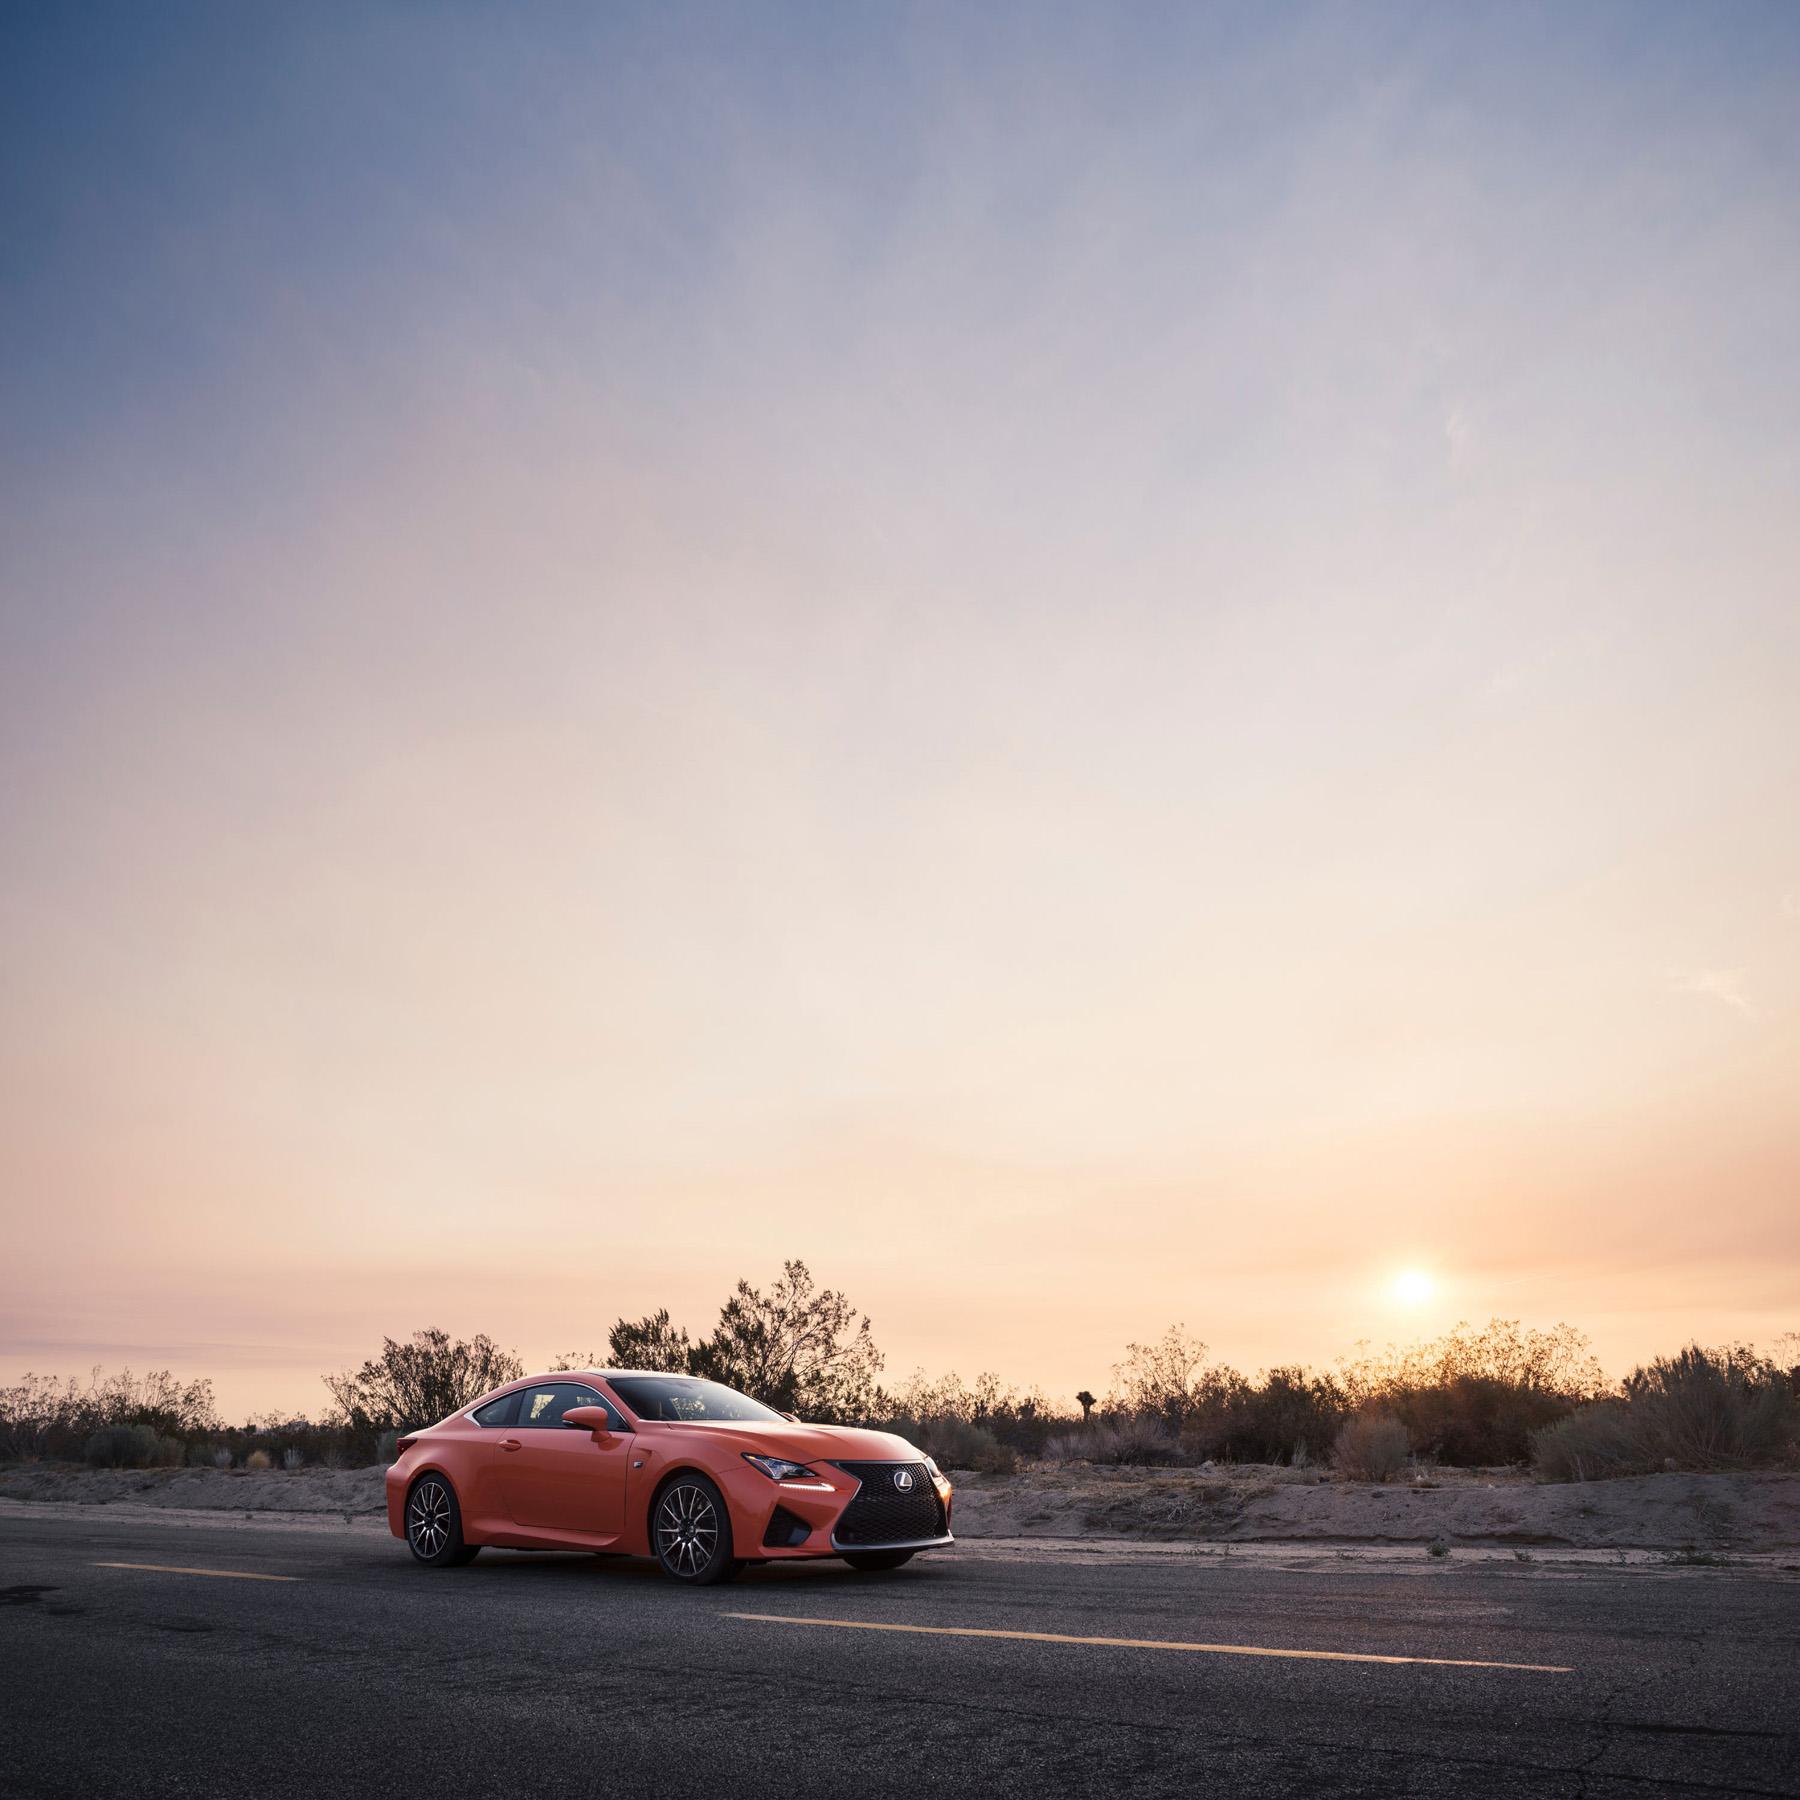 2015 Lexus Rc Suspension: Auto Review: 2015 Lexus RC F